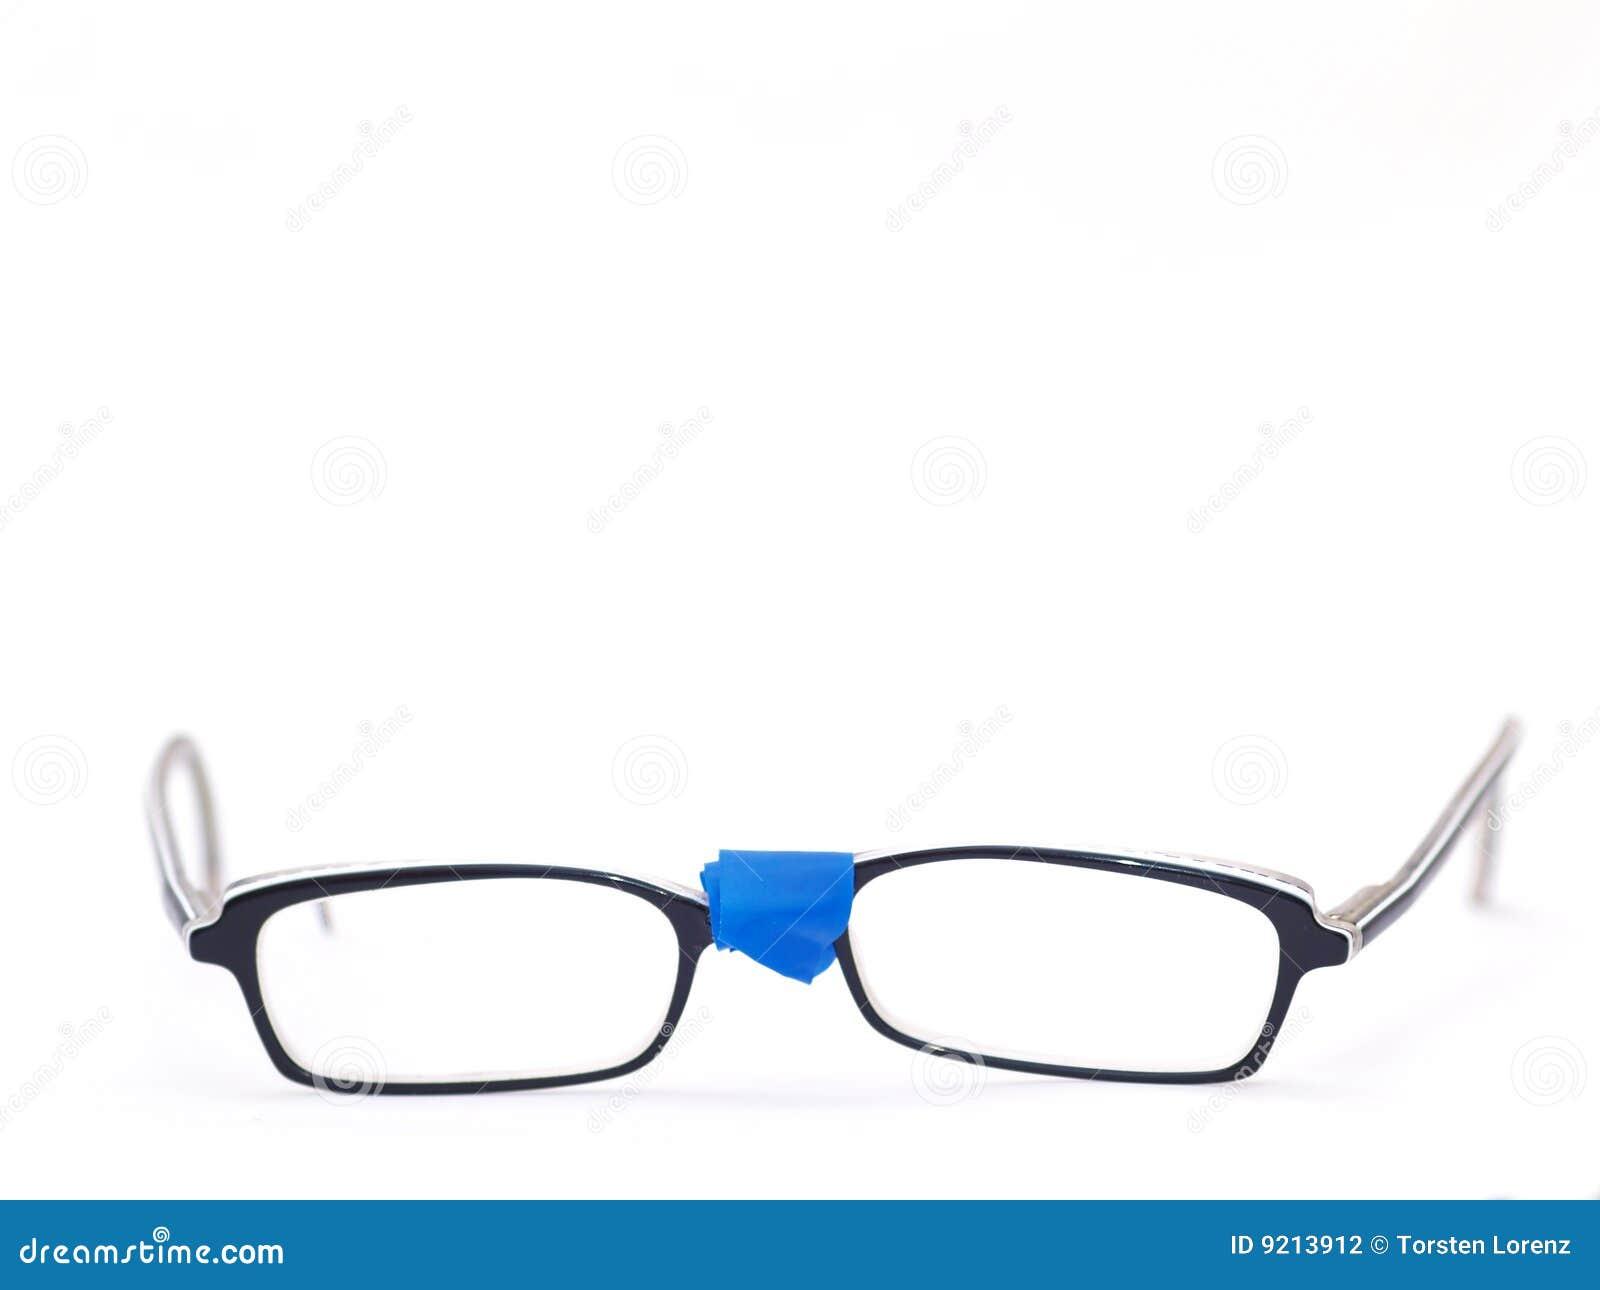 Broken eyeglasses stock photo. Image of destroyed, repaired - 9213912